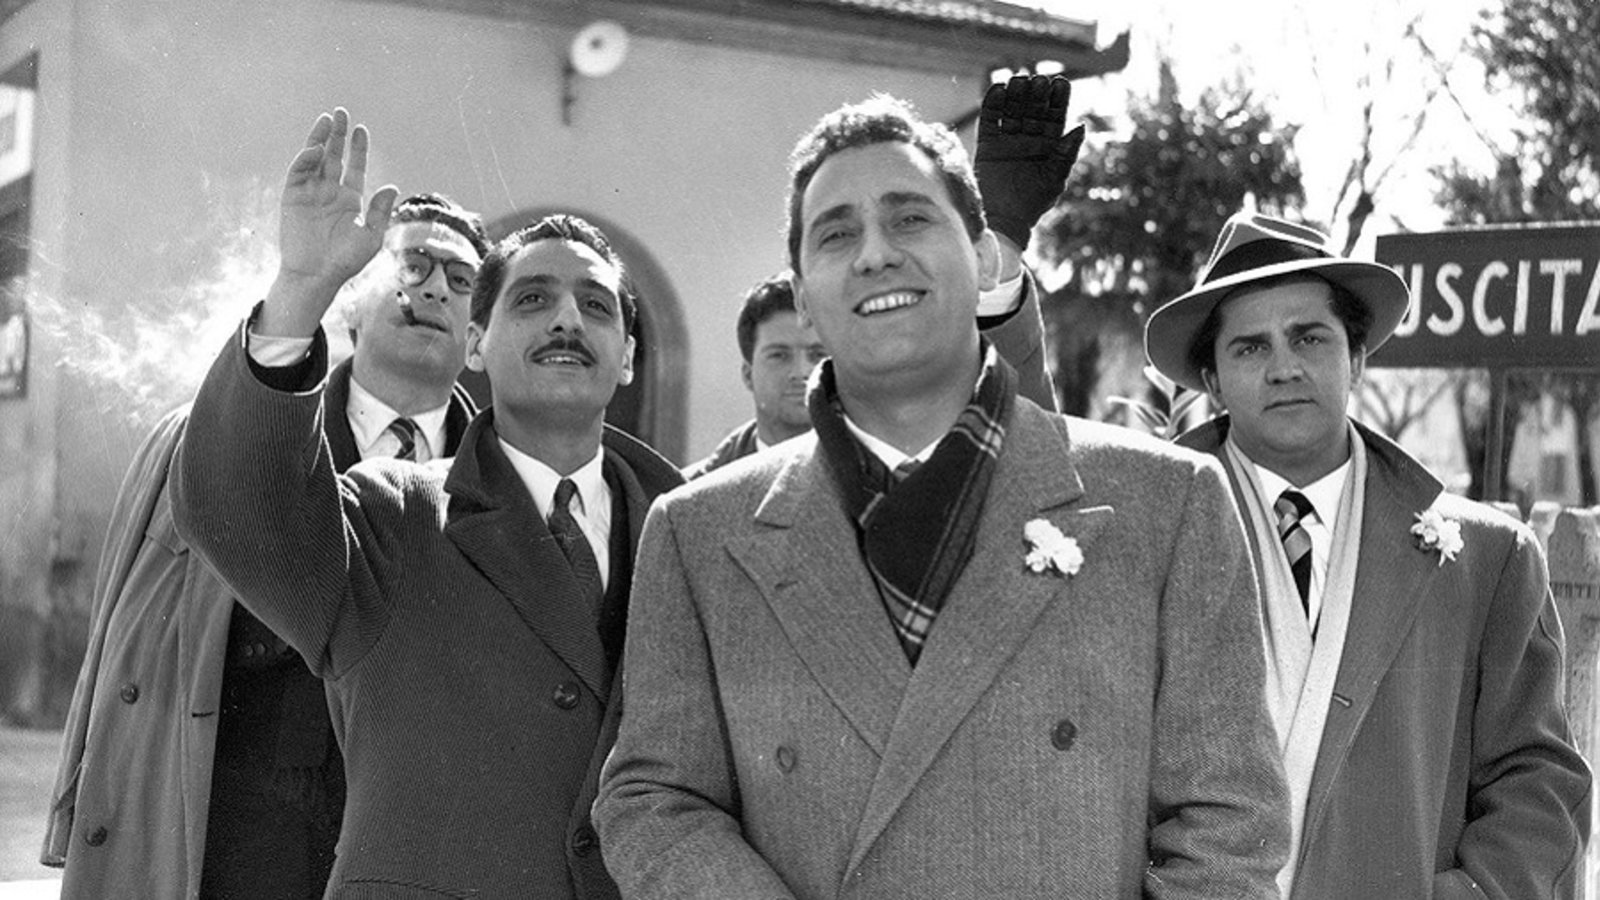 A Movie a Day, Day 90: I Vitelloni